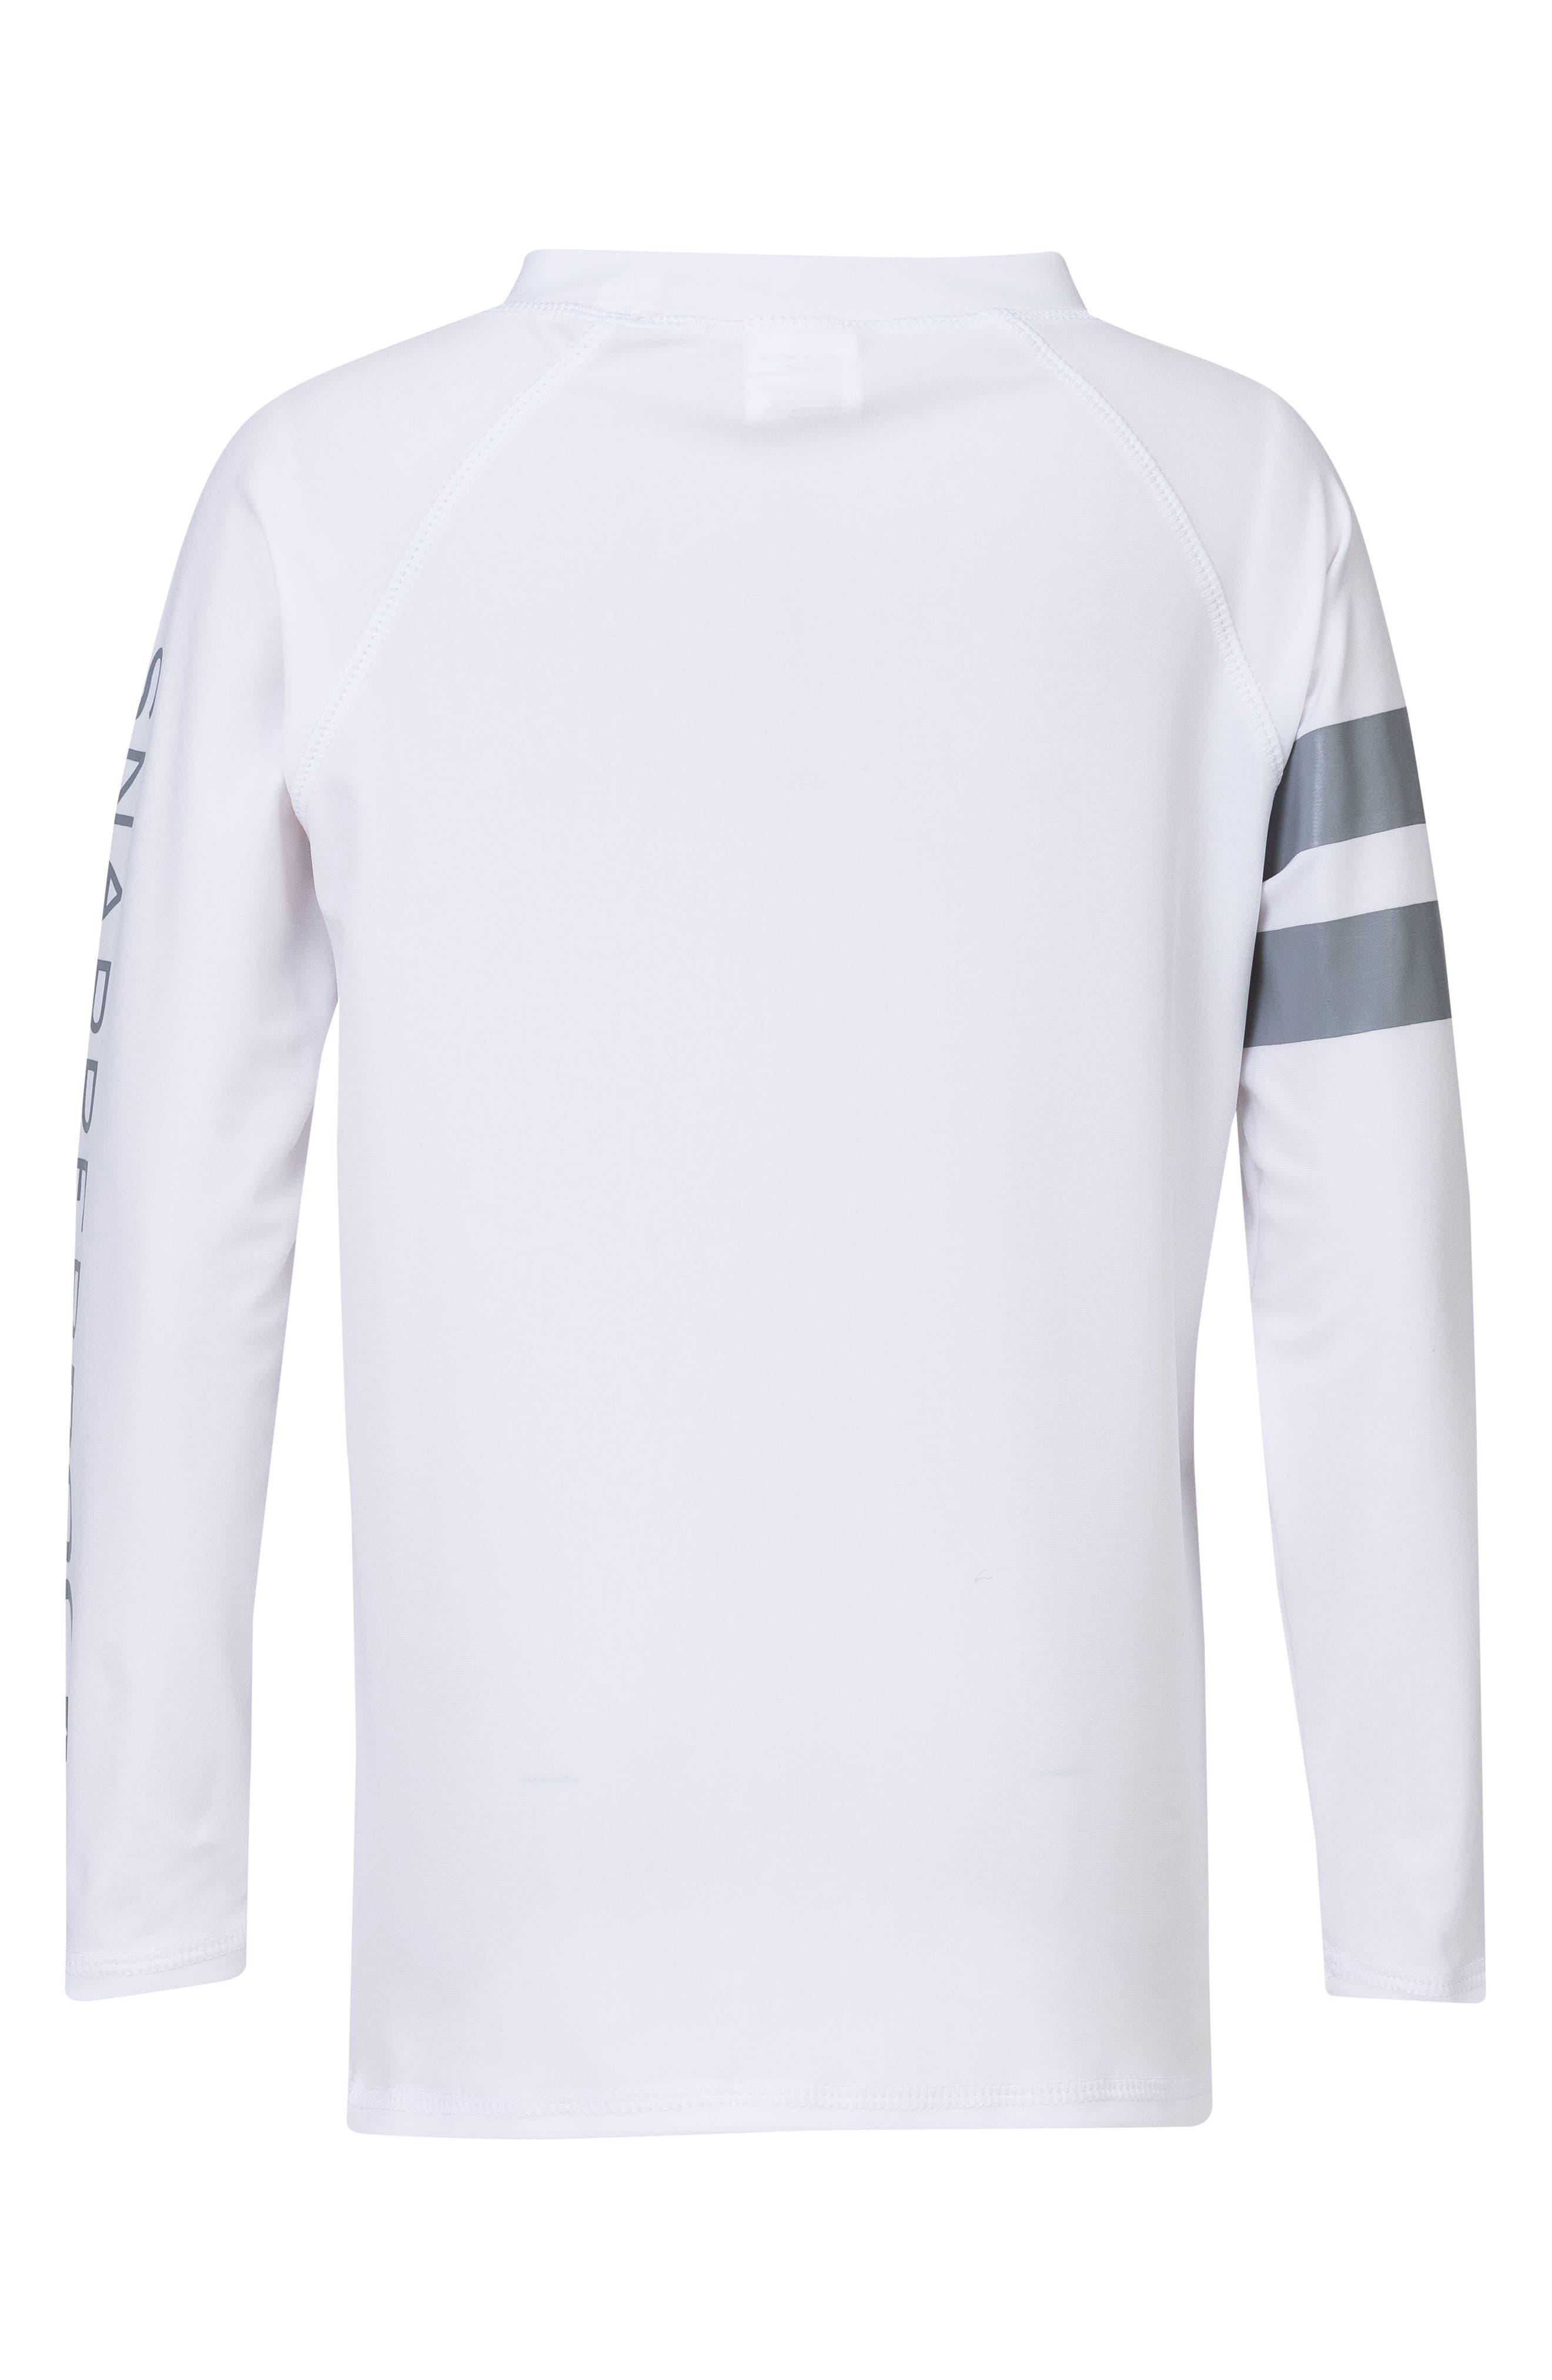 Raglan Long Sleeve Rashguard,                             Alternate thumbnail 2, color,                             White/ Grey